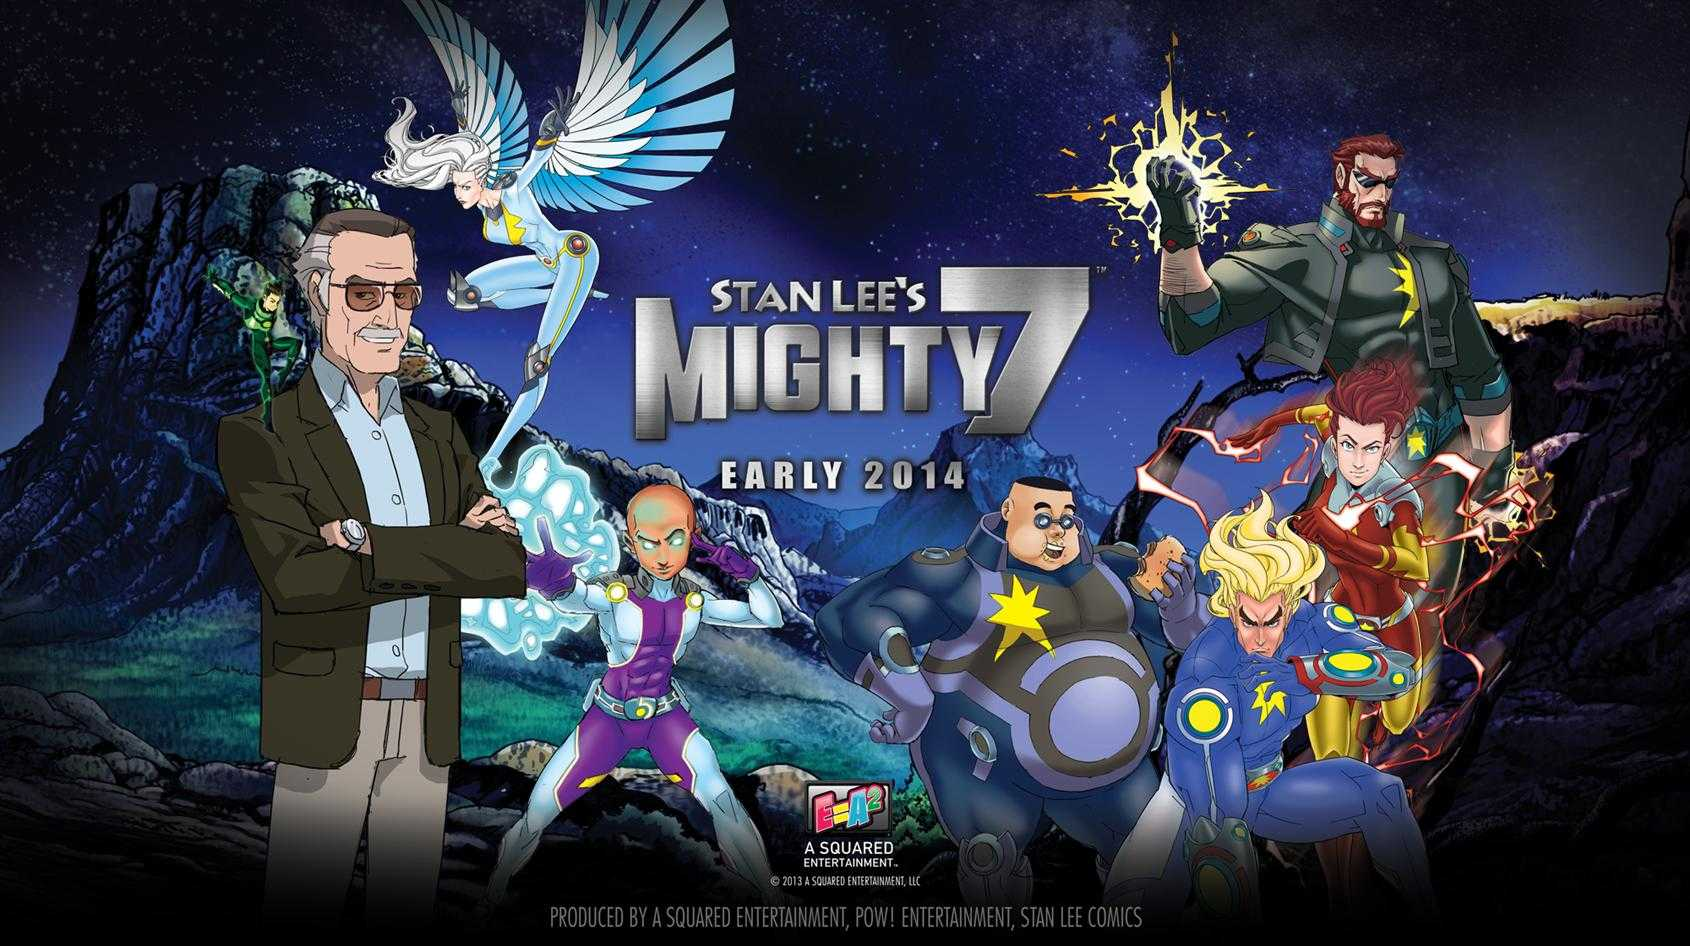 Sneak Peek: Stan Lee's Mighty Seven's All Star Cast Dominates